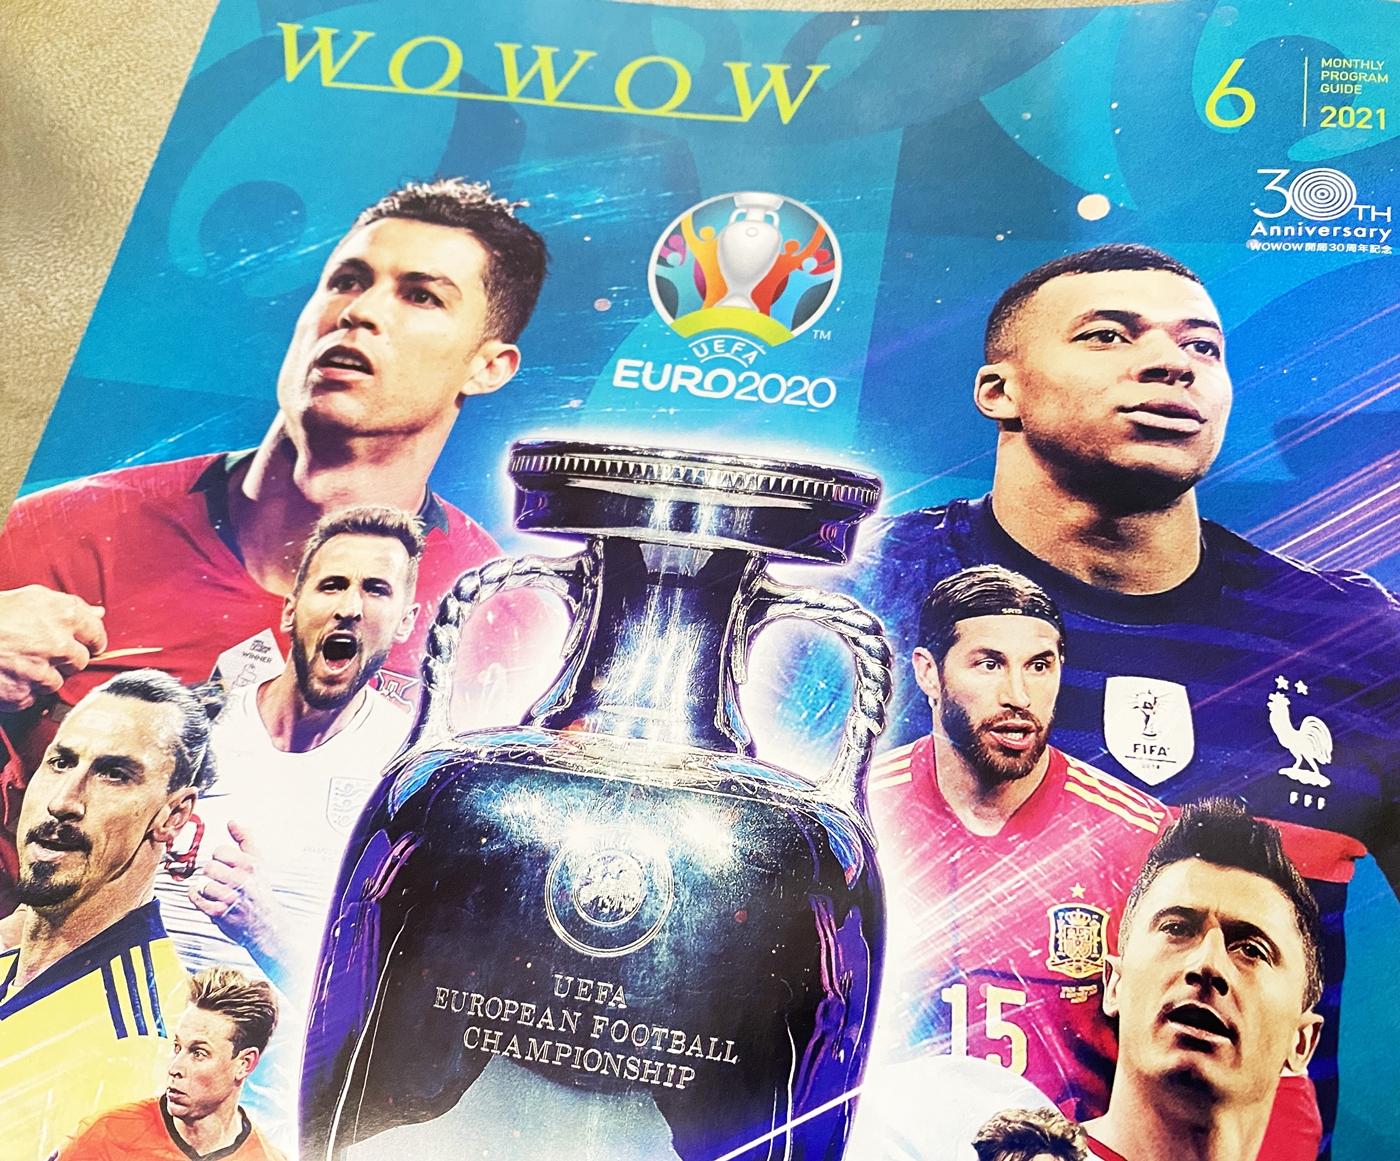 WOWOWのEURO2020(ユーロ2020)の特集会員向け冊子